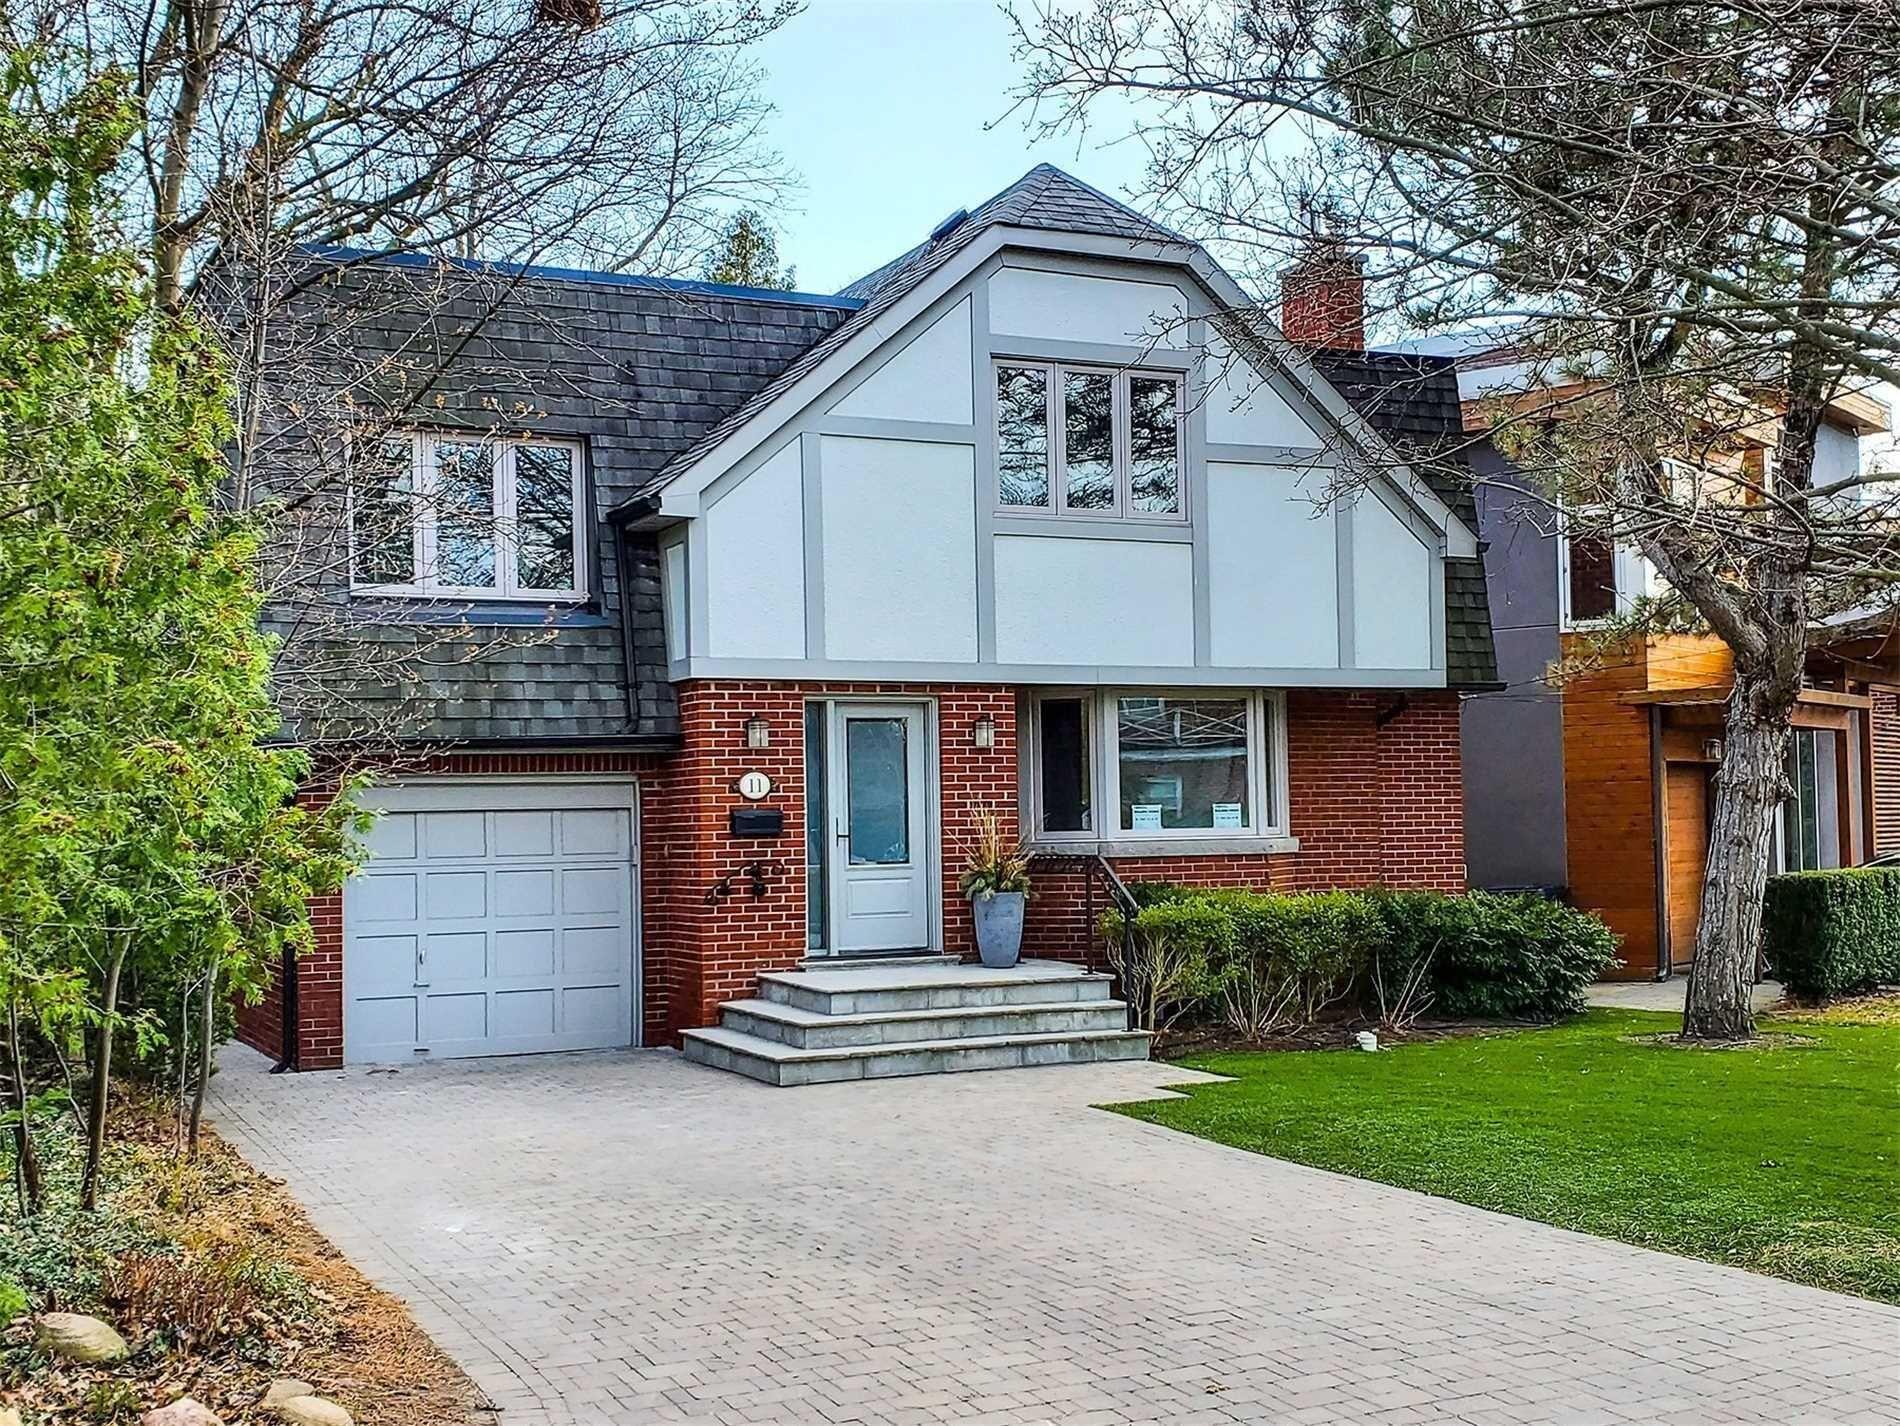 Main Photo: 11 Glen Oak Drive in Toronto: The Beaches House (2-Storey) for lease (Toronto E02)  : MLS®# E4758763